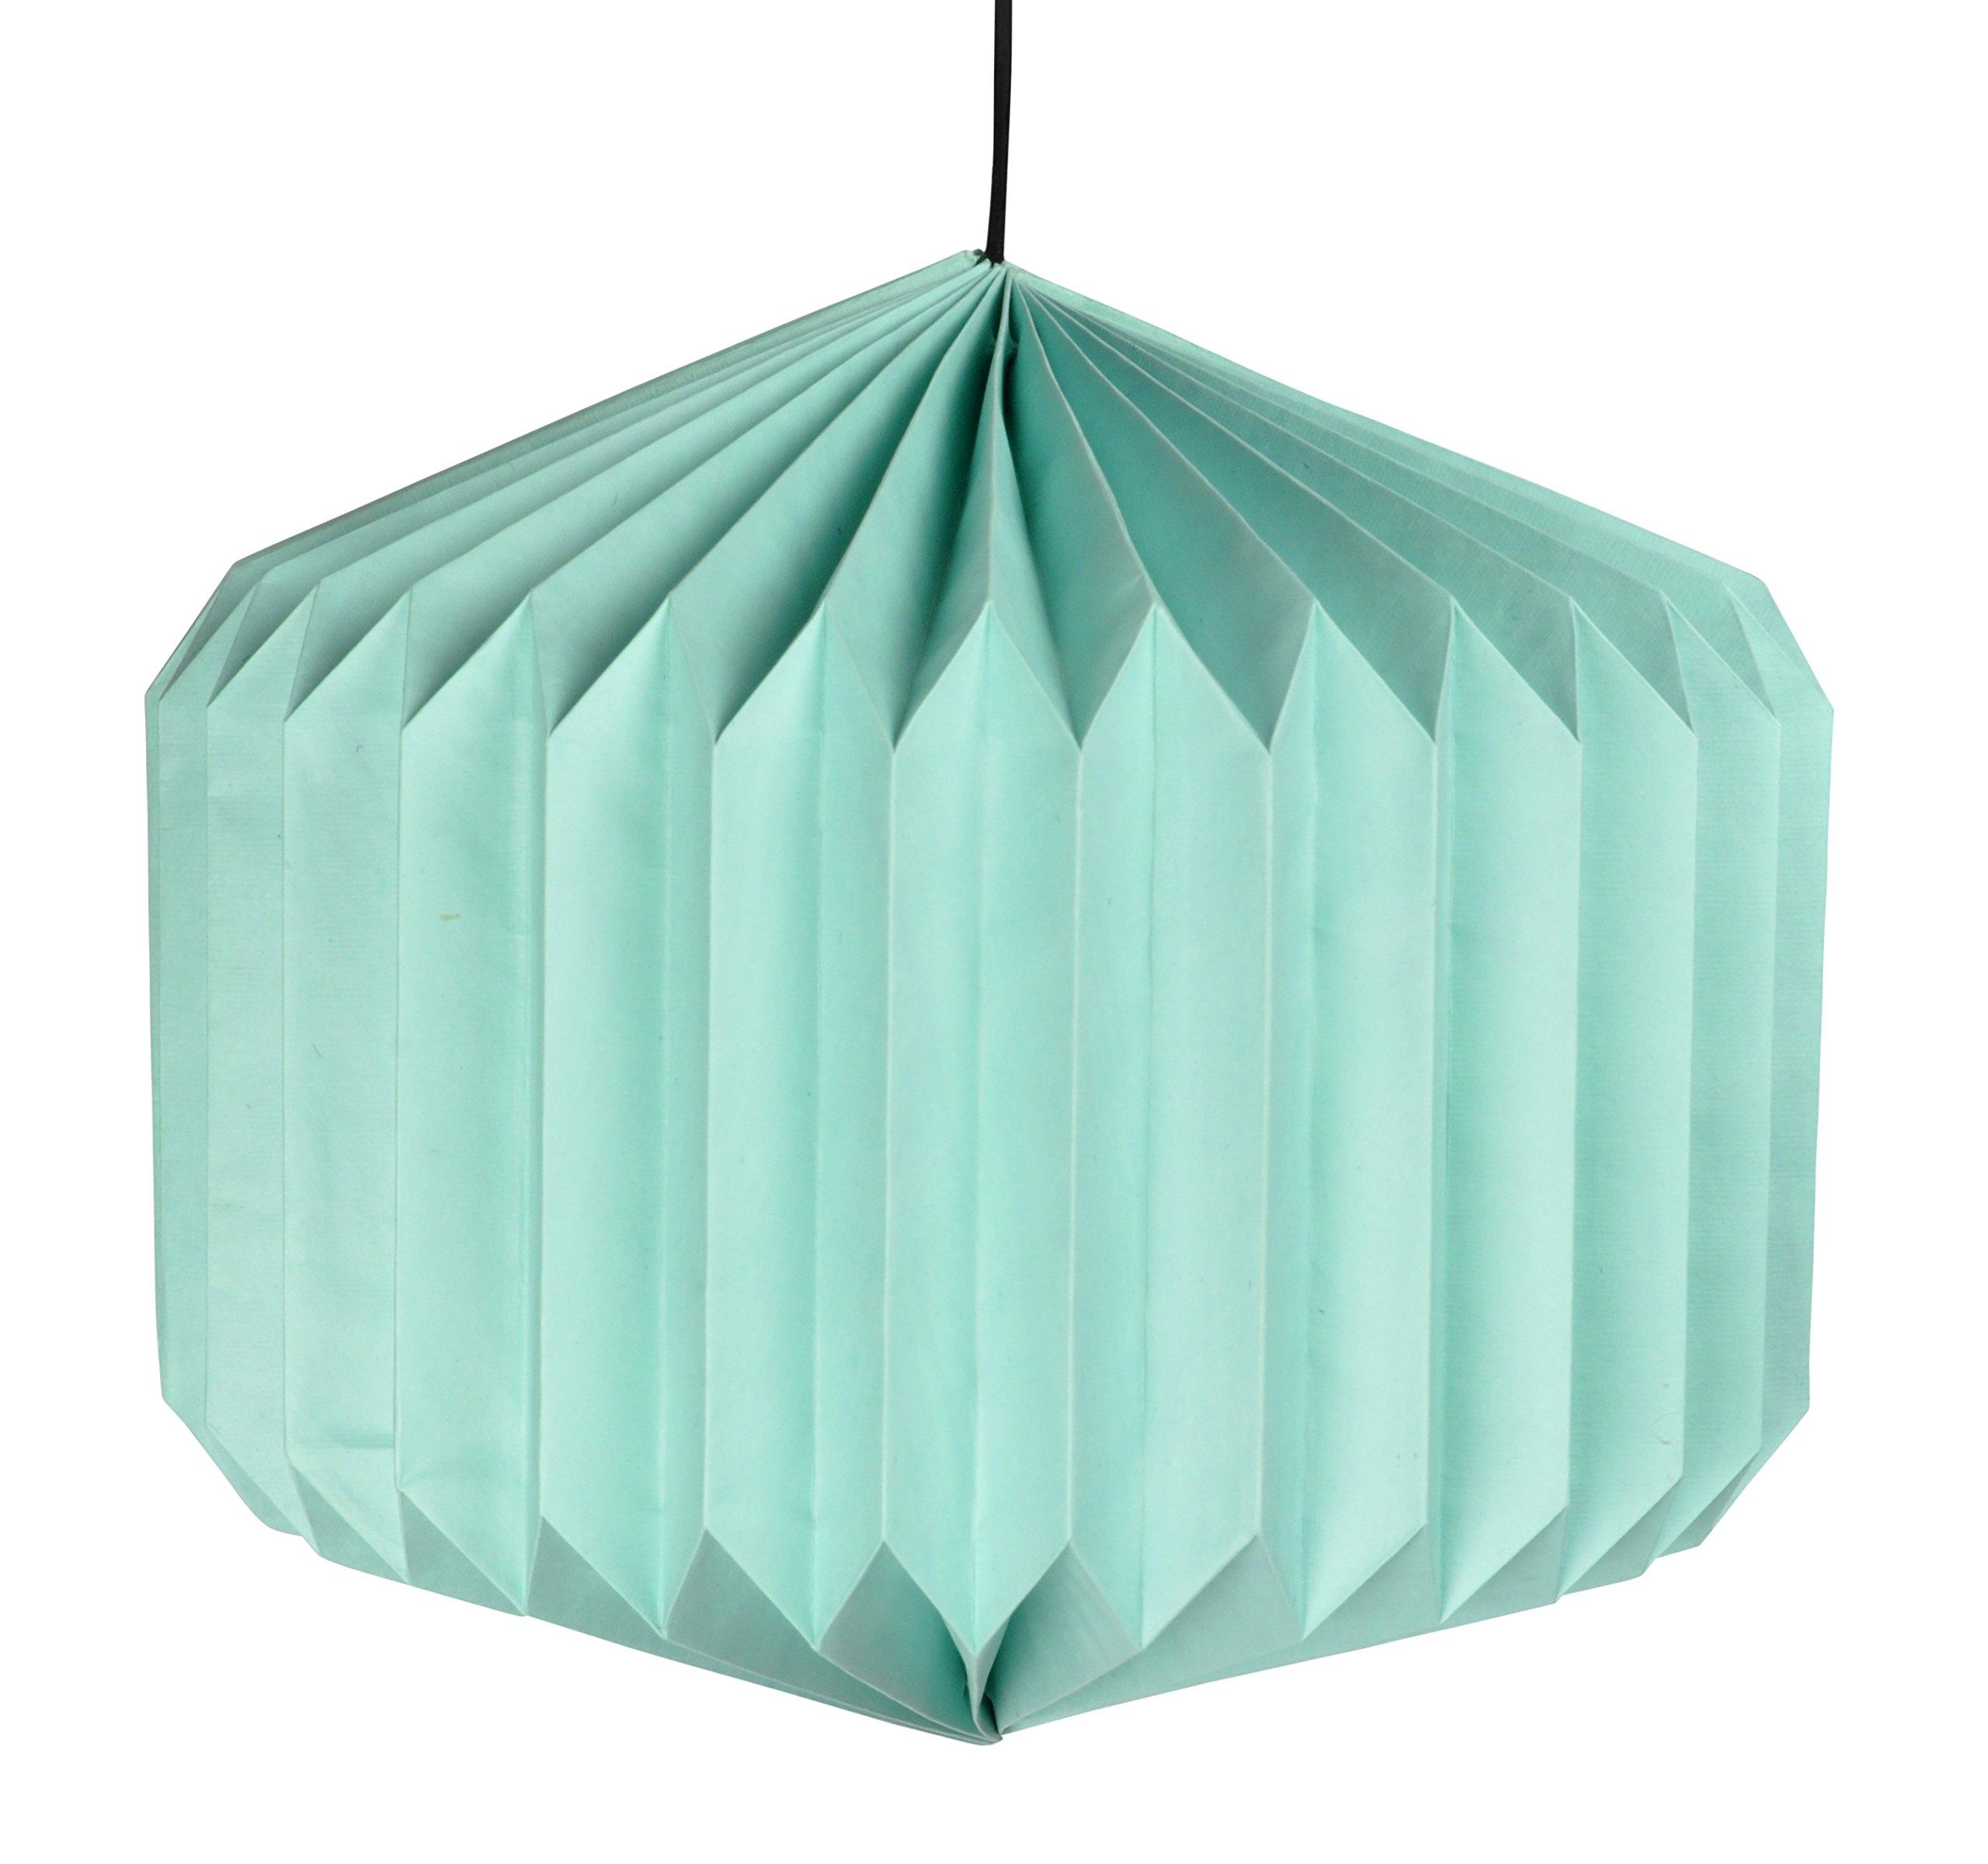 Lalhaveli Paper Lantern String Lights 14 X 17 Inches